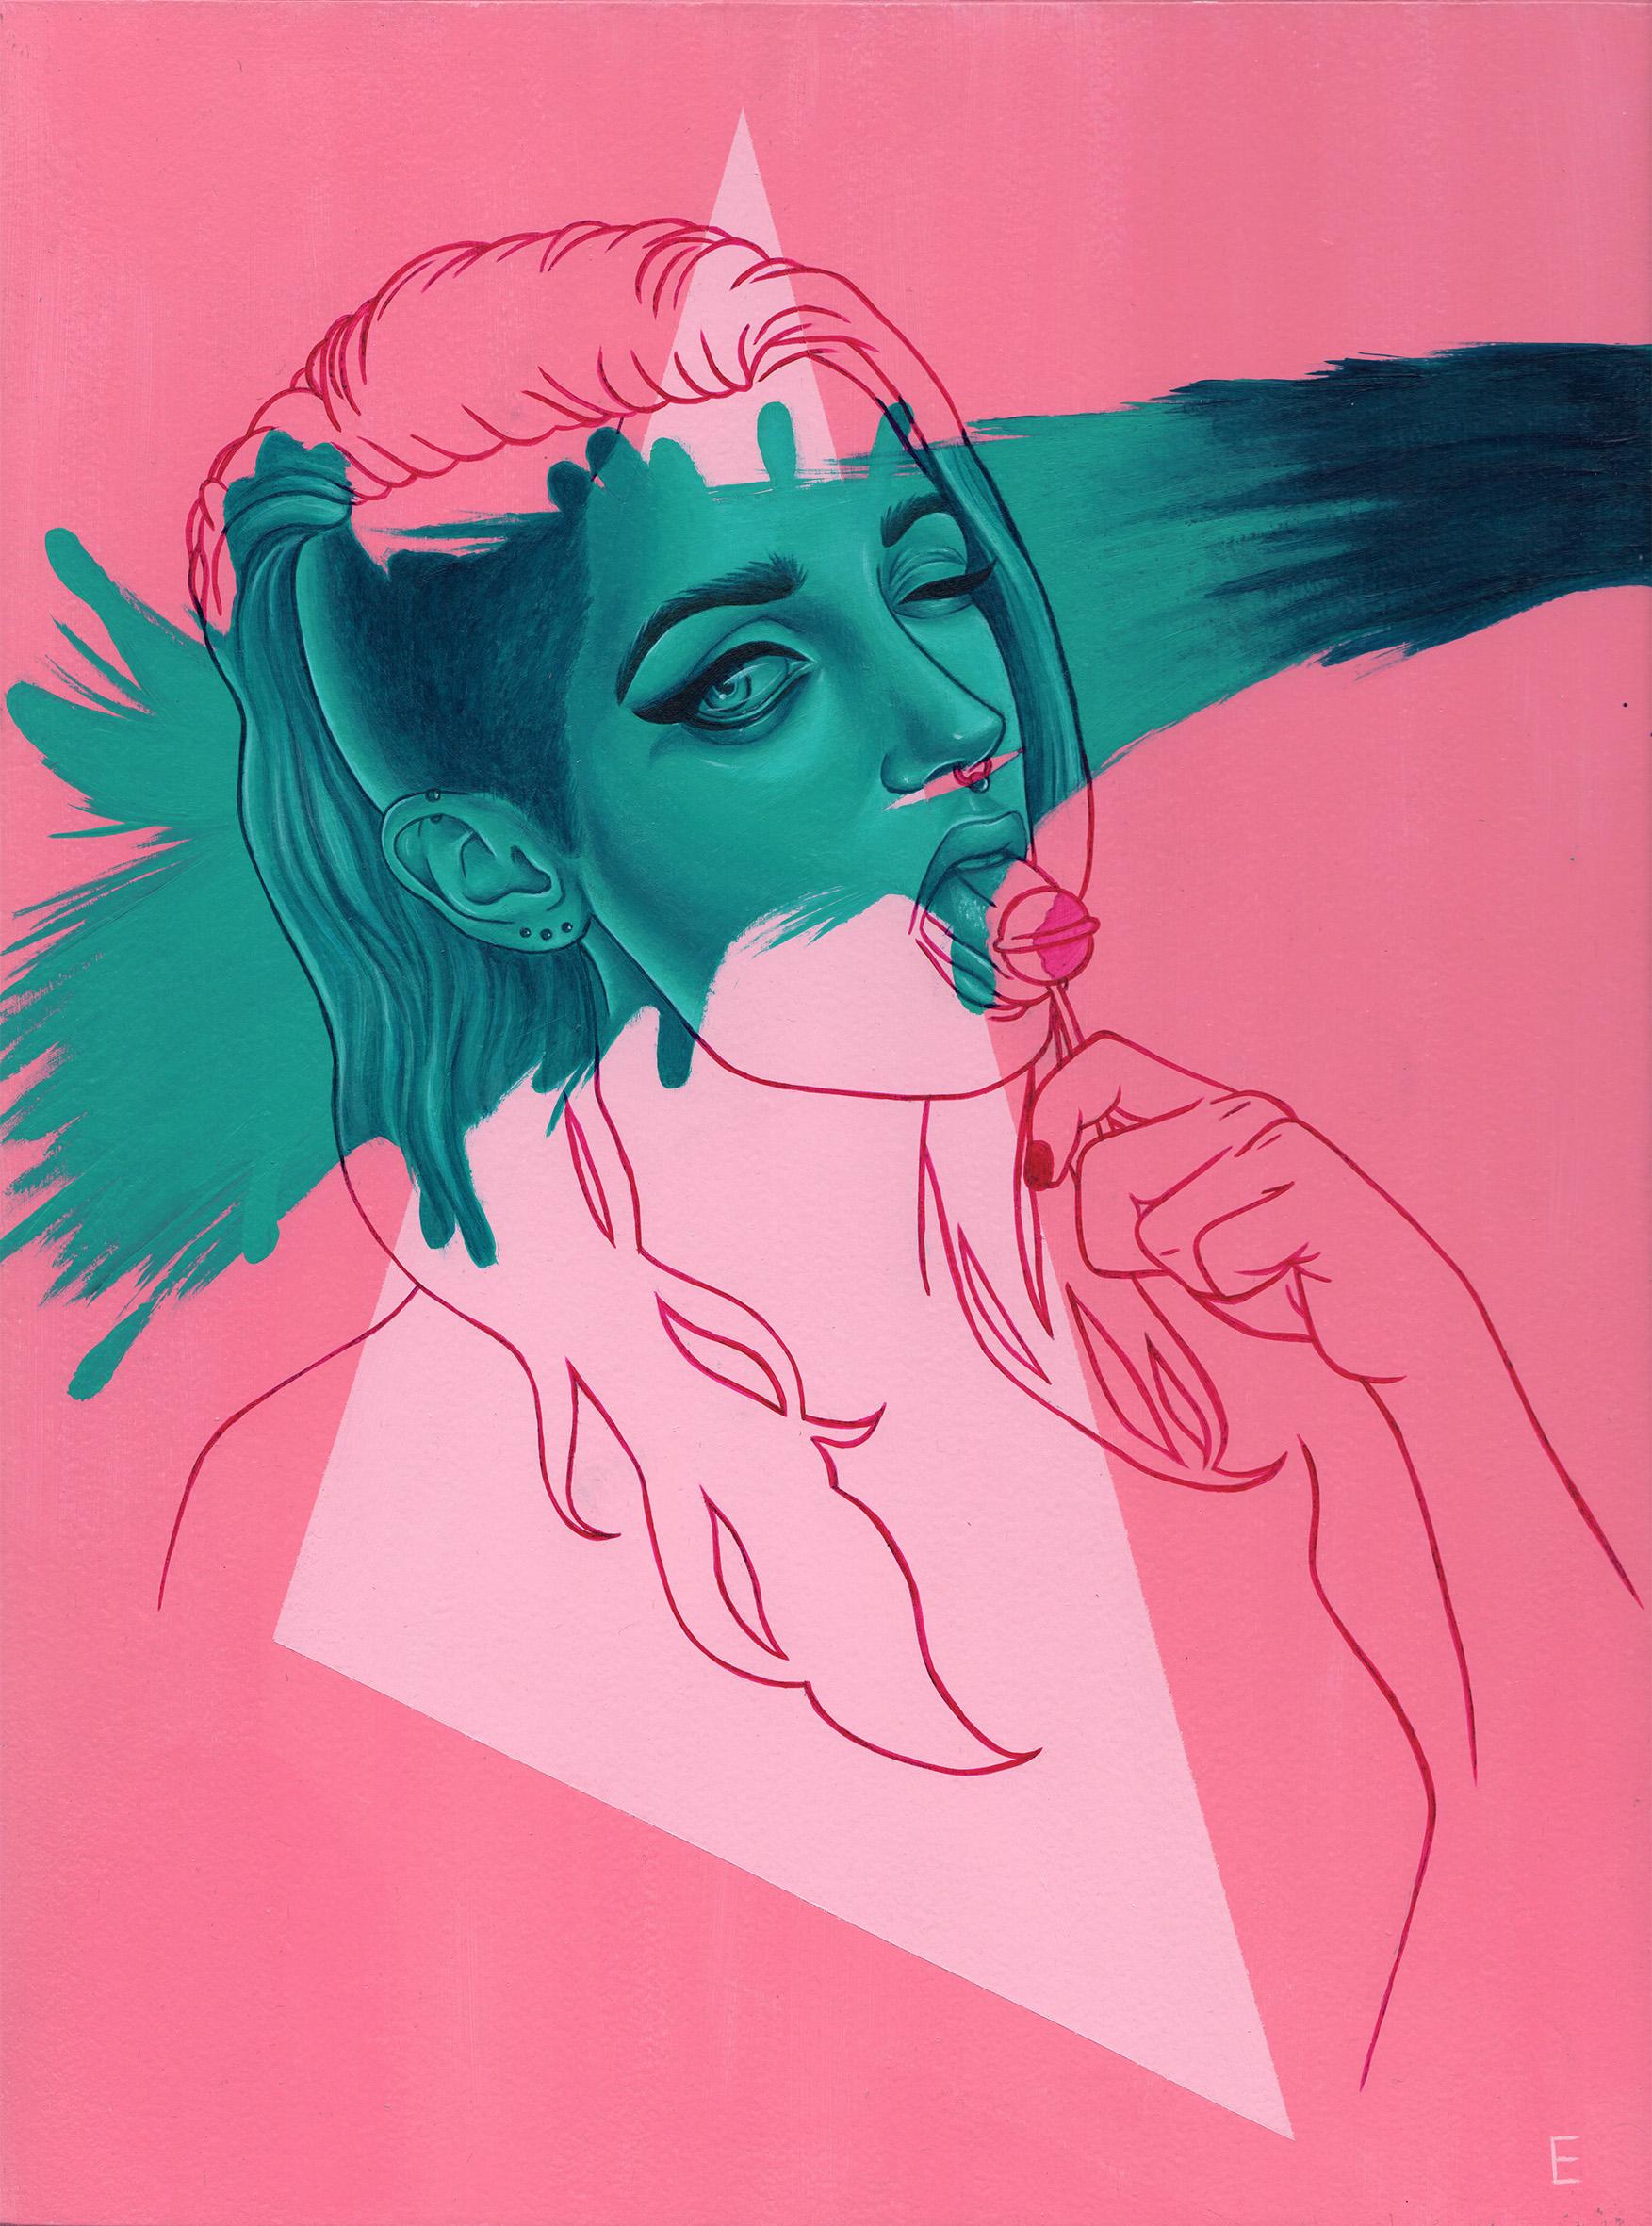 """Poppy"" by Miss E"